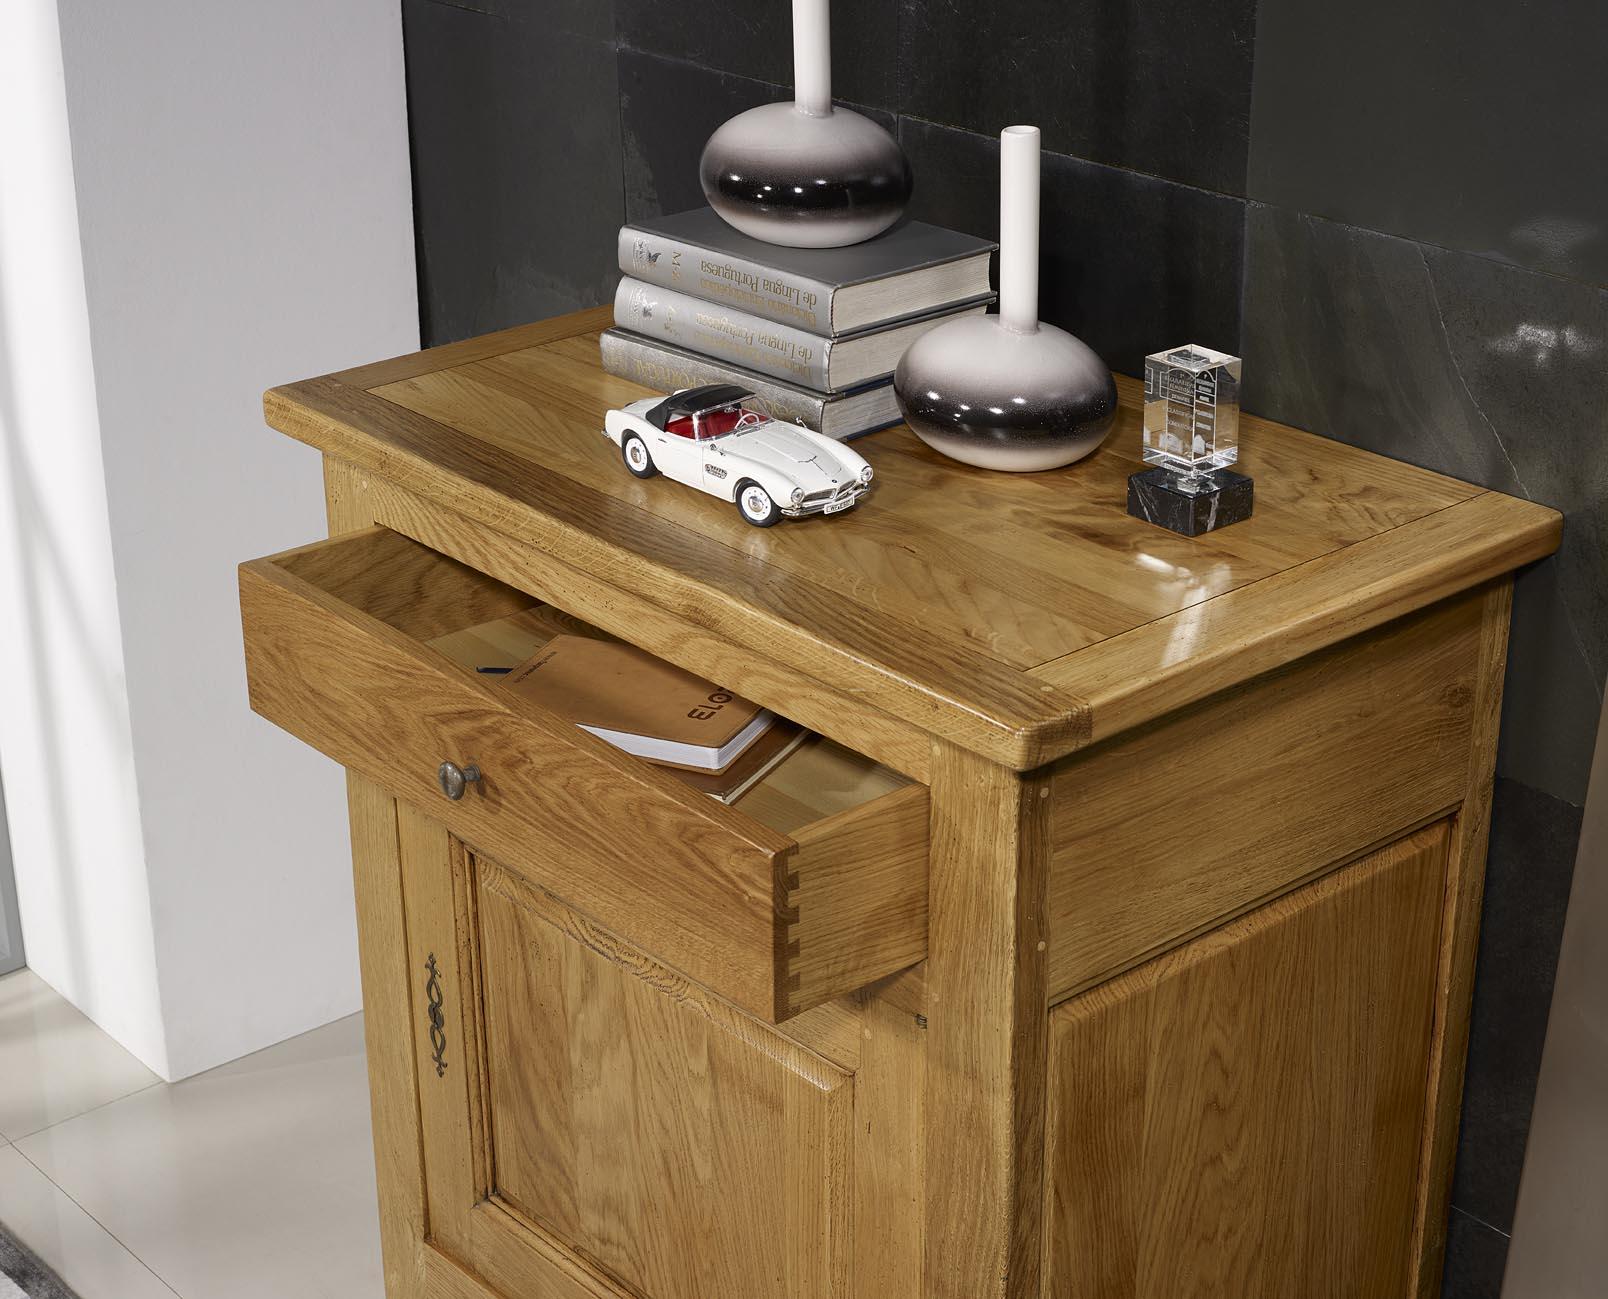 Confitutier 1 porte 1 tiroir en ch ne massif de style - Meuble style campagnard ...